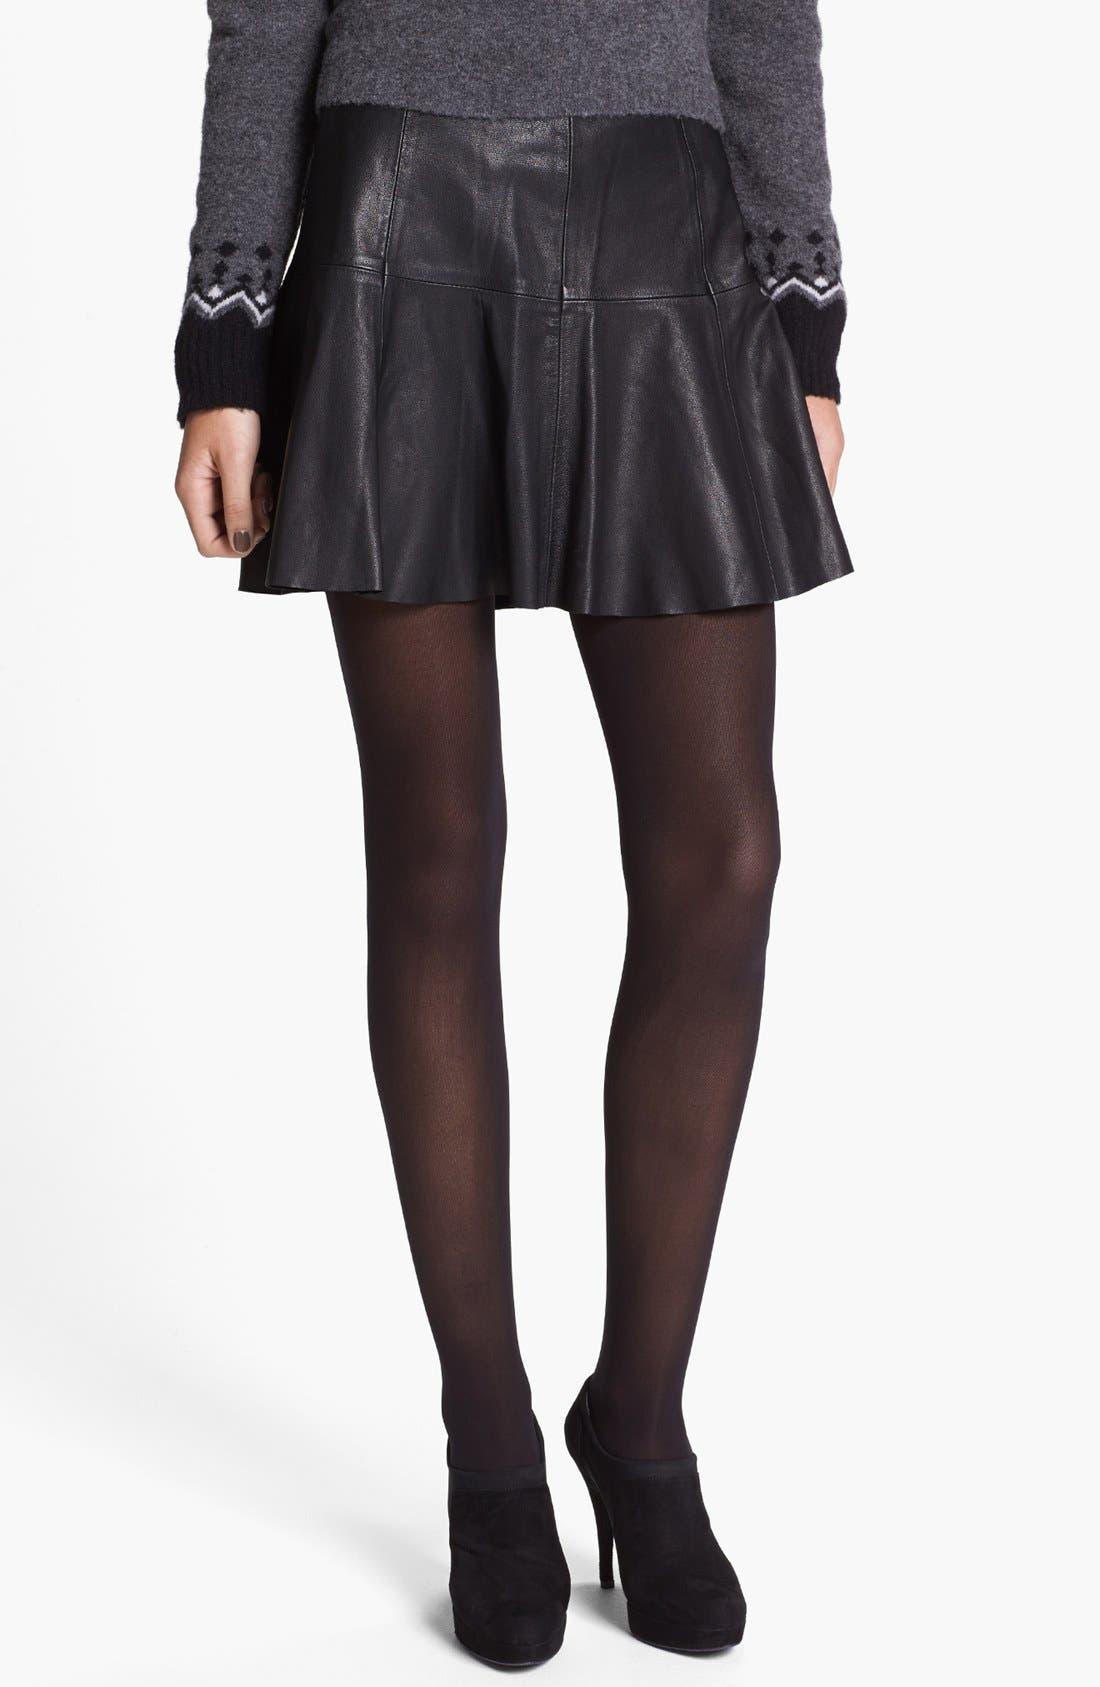 joie terina paneled leather skirt nordstrom